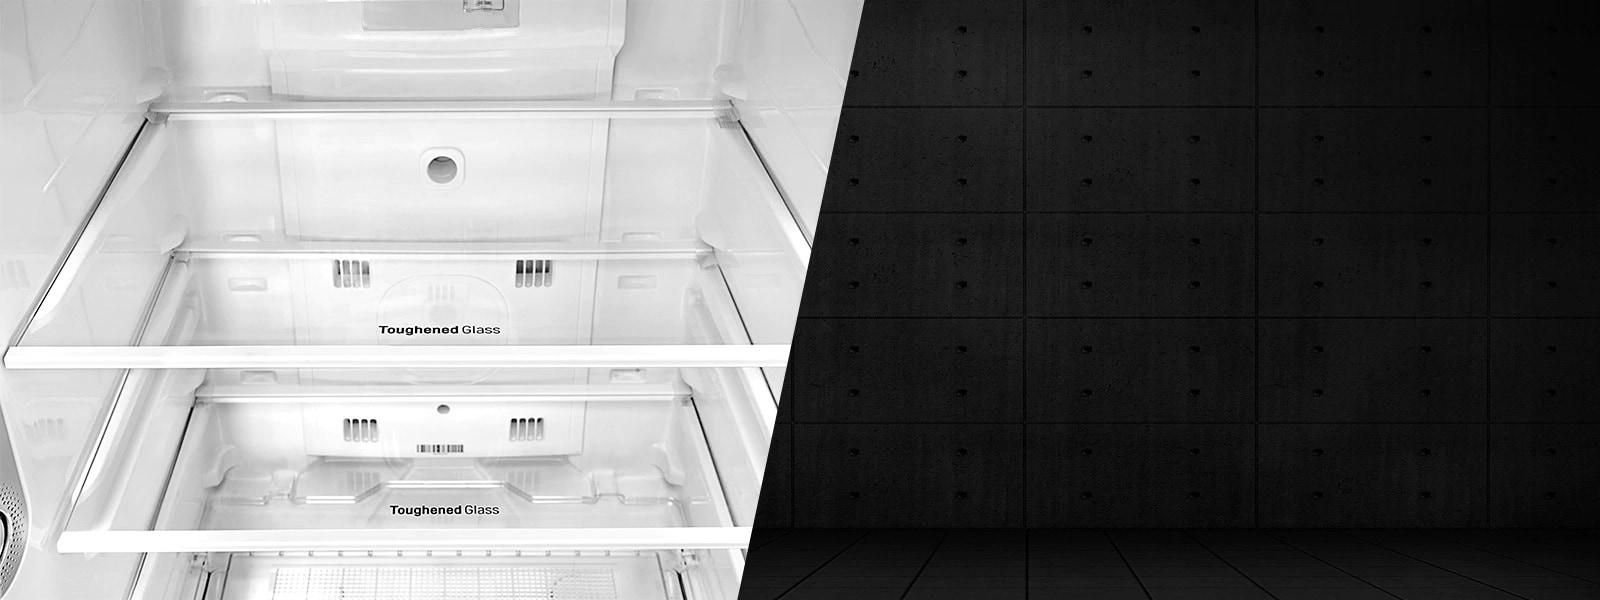 LG GL-N292BRGY Toughened Glass Shelves